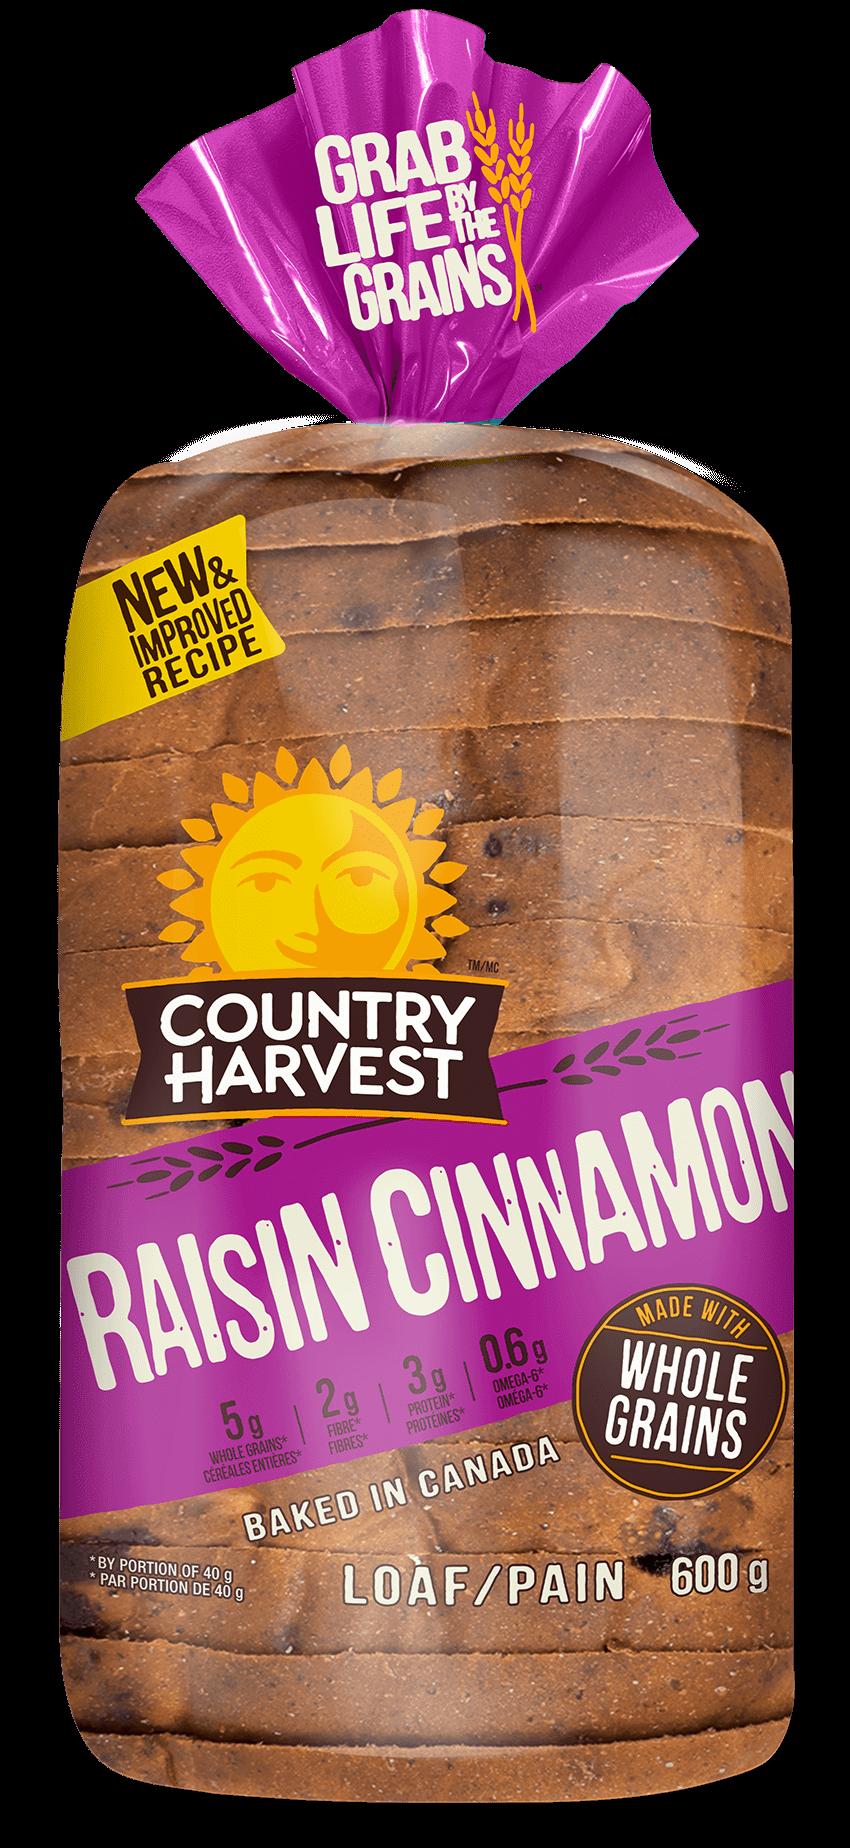 Country-Harvest-Raisin-Cinnamon-PacK